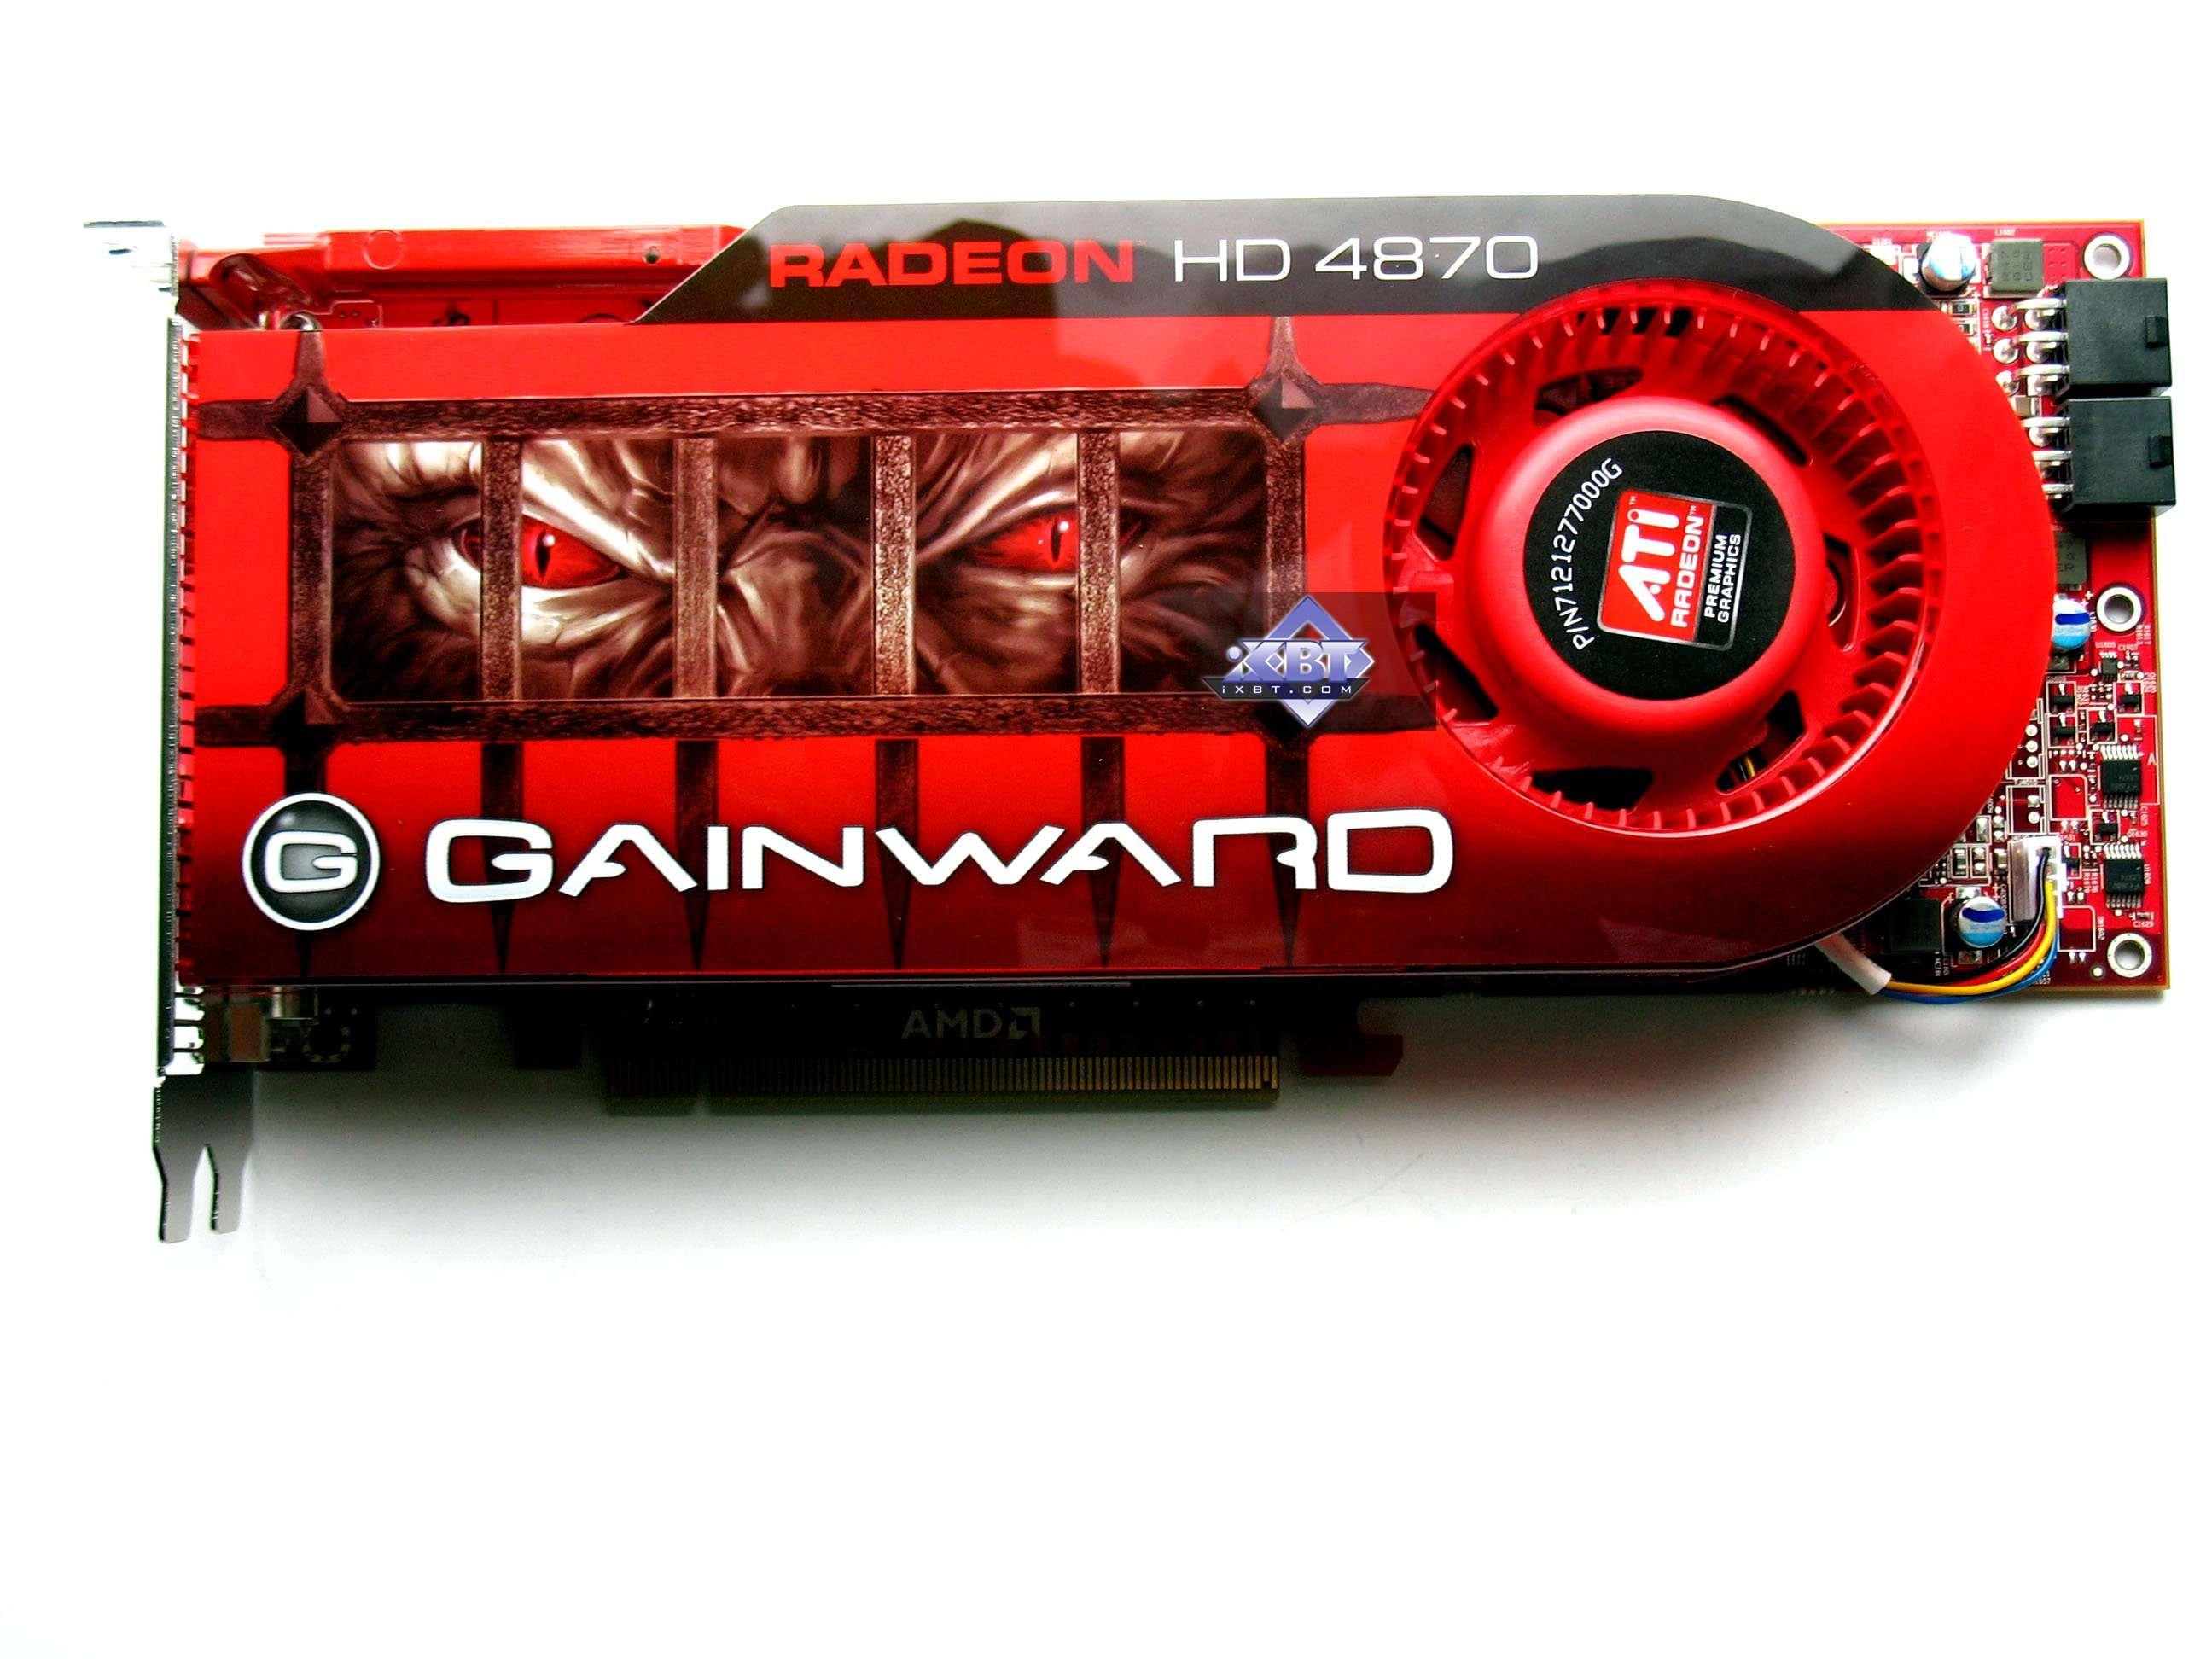 GAINWARD RADEON HD 4870 TREIBER WINDOWS 8